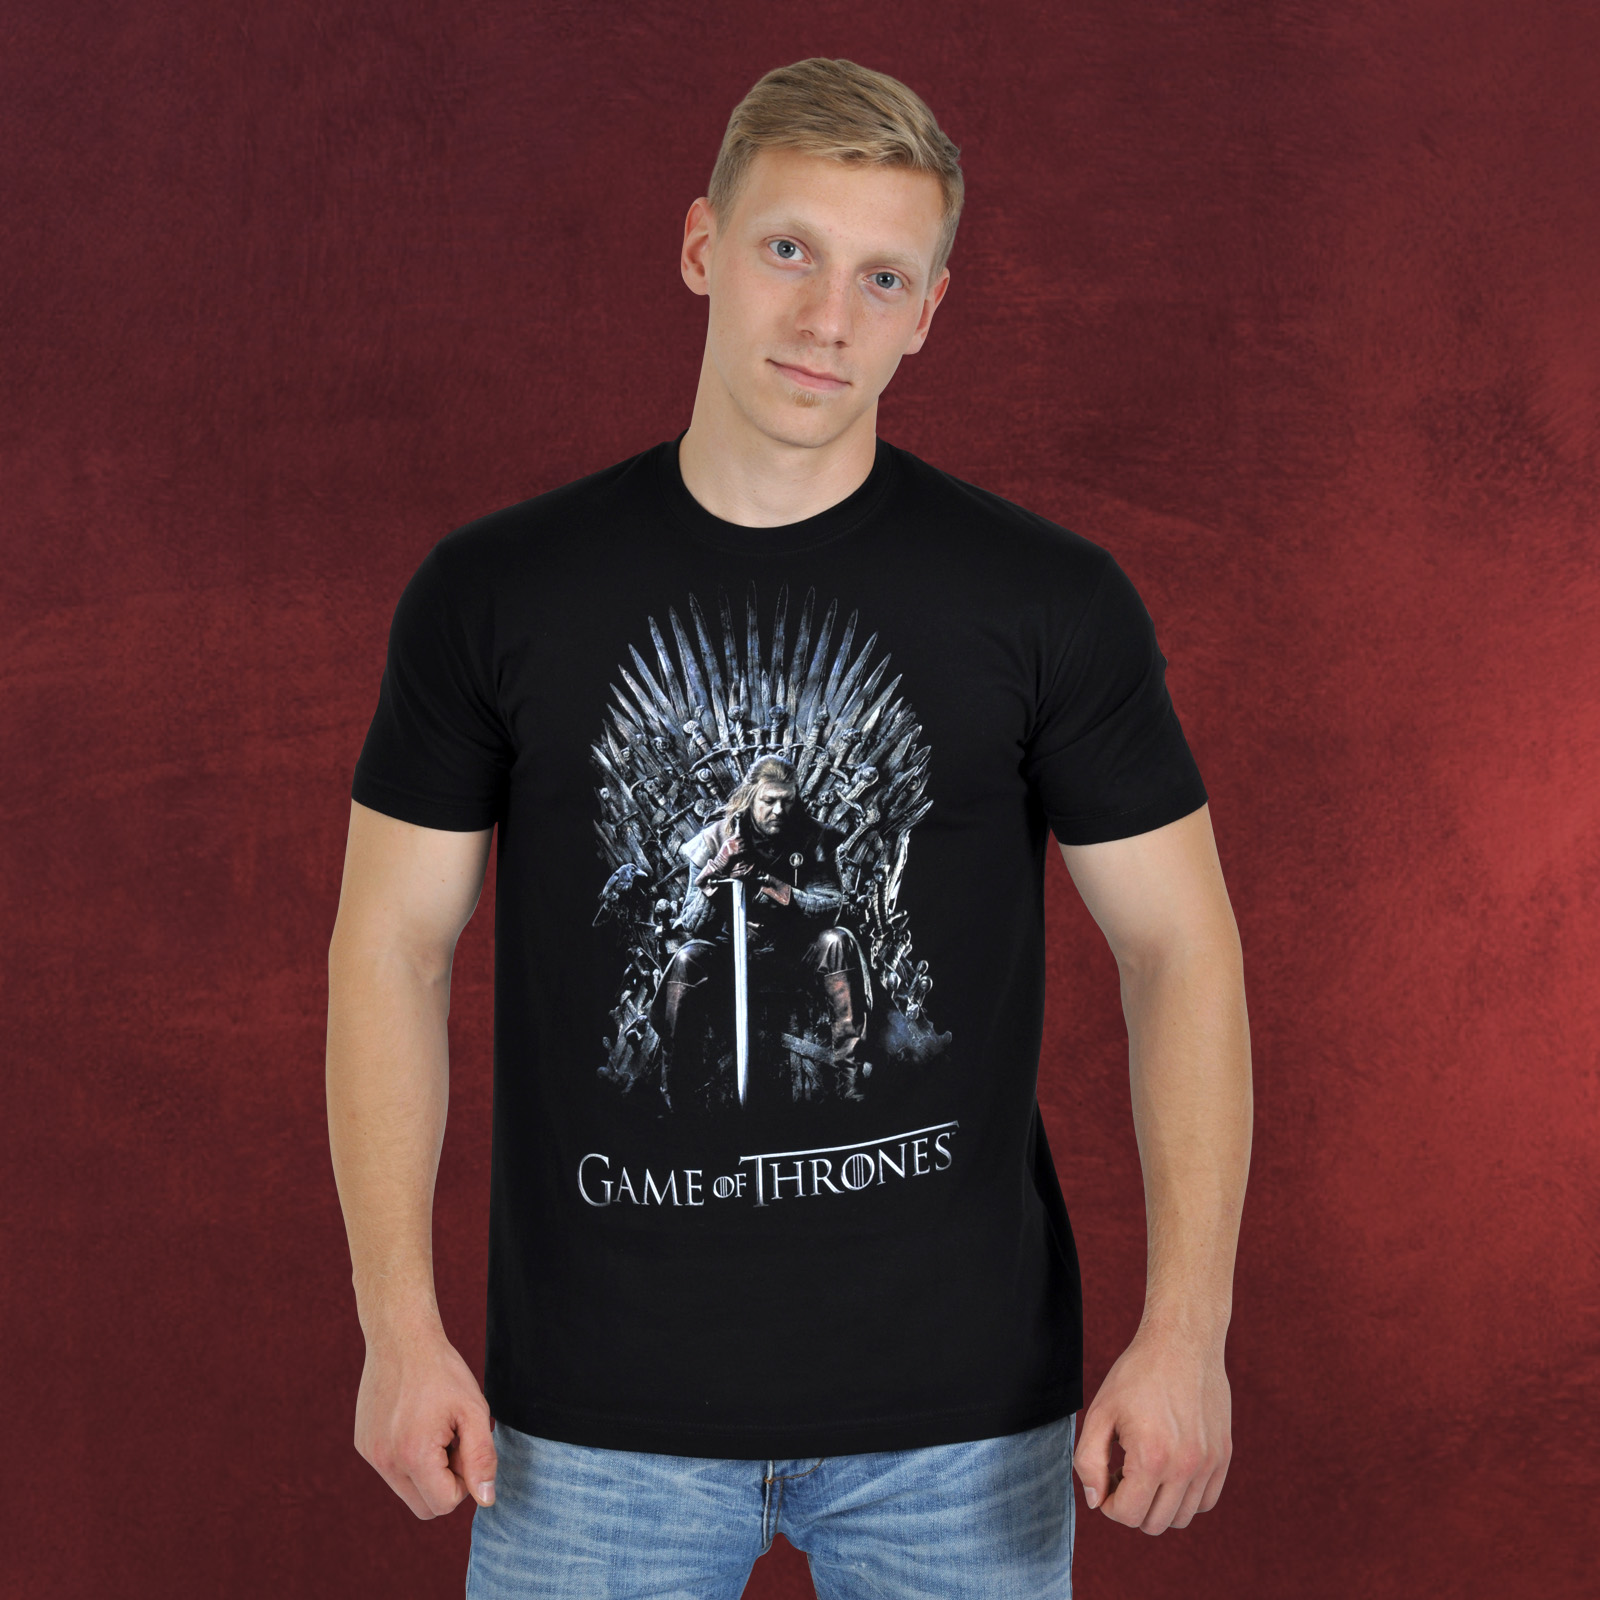 game of thrones teaser season 1 t shirt elbenwald. Black Bedroom Furniture Sets. Home Design Ideas